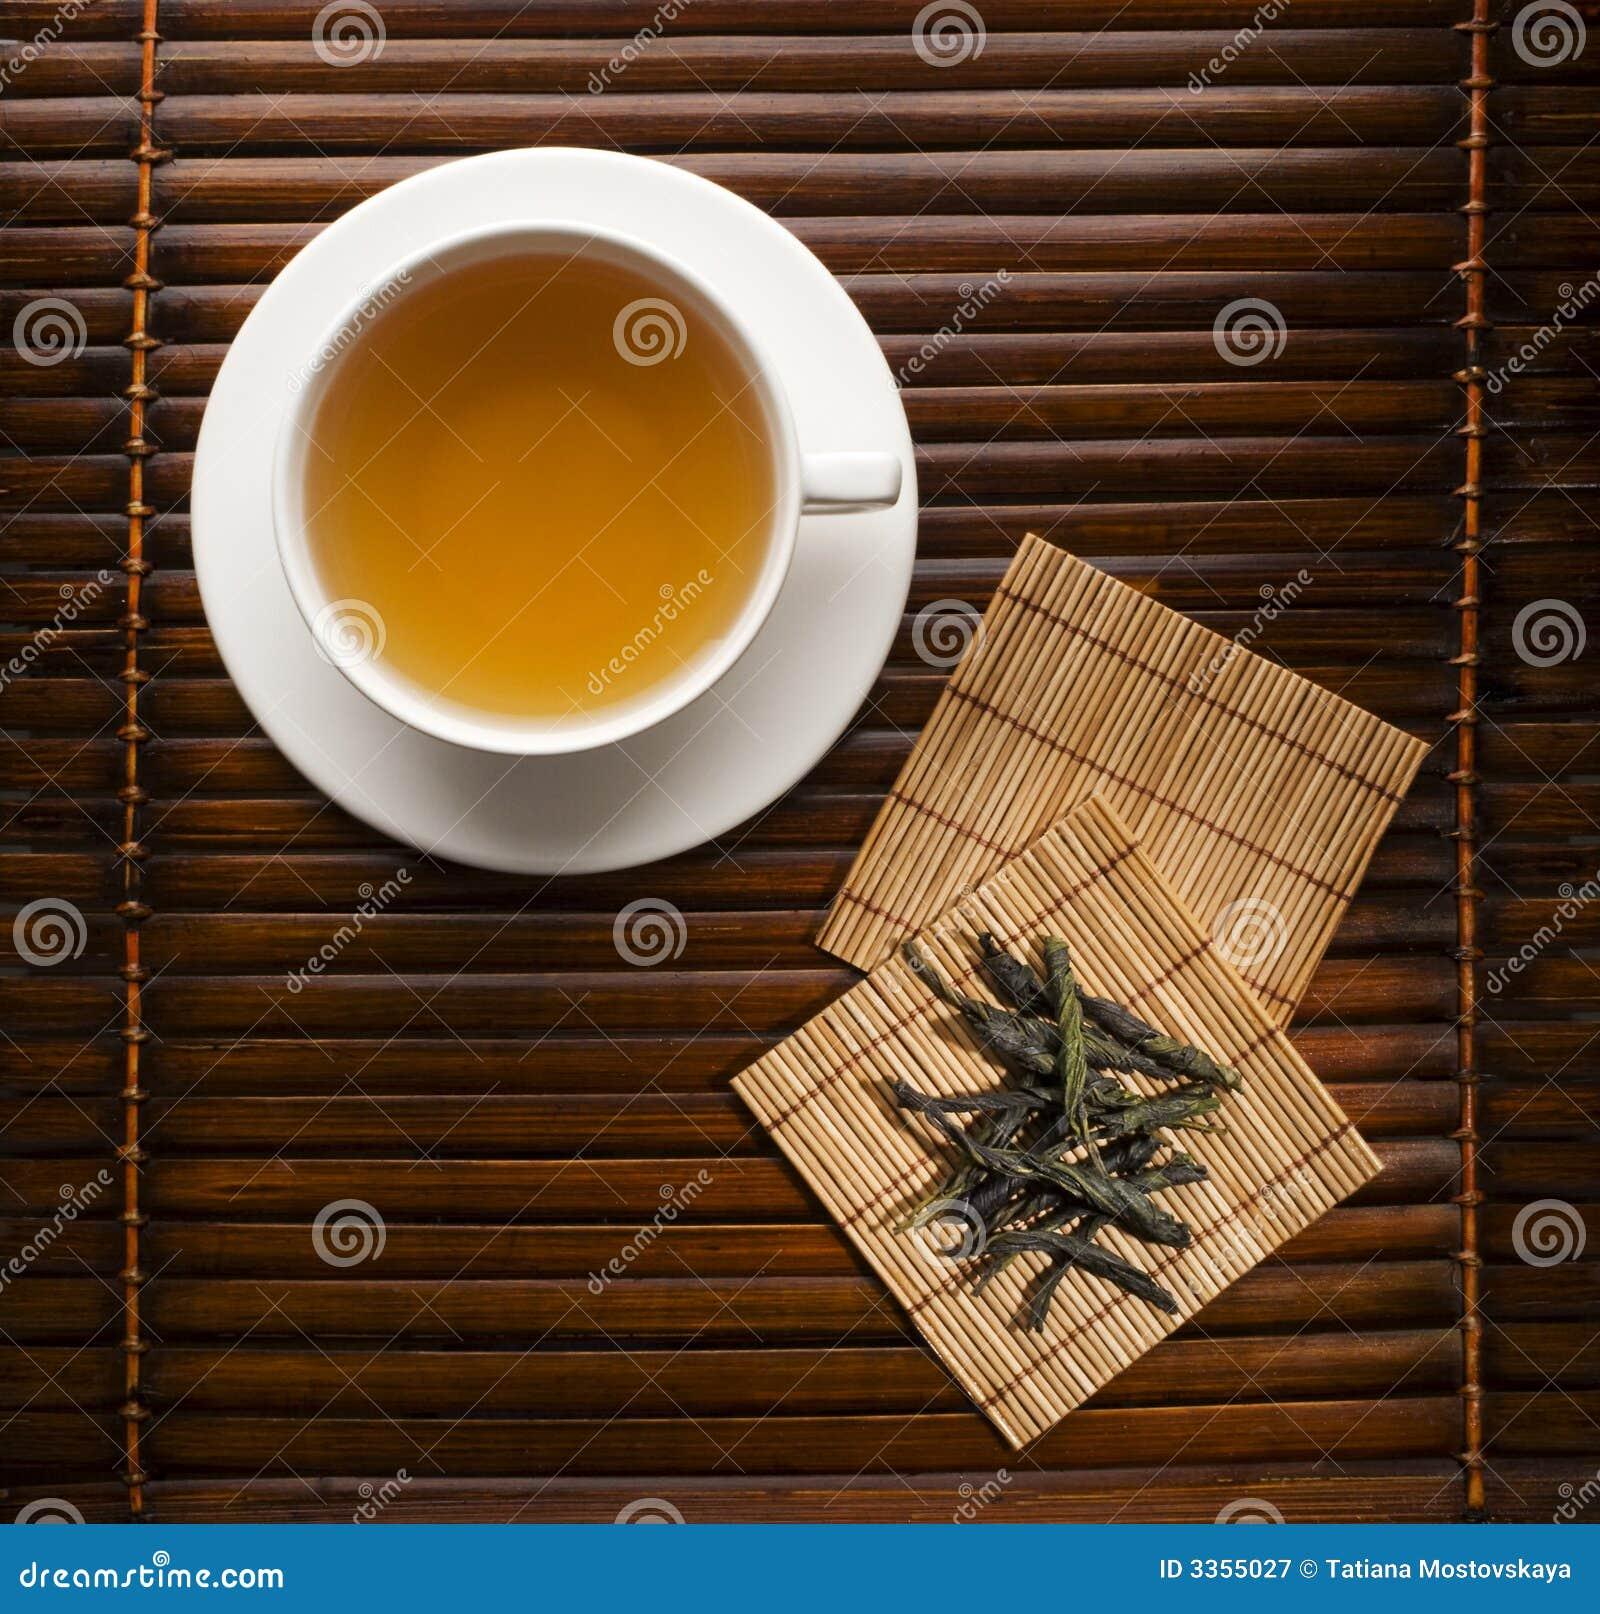 Business plan organic tea depot Custom paper Example - July 2019